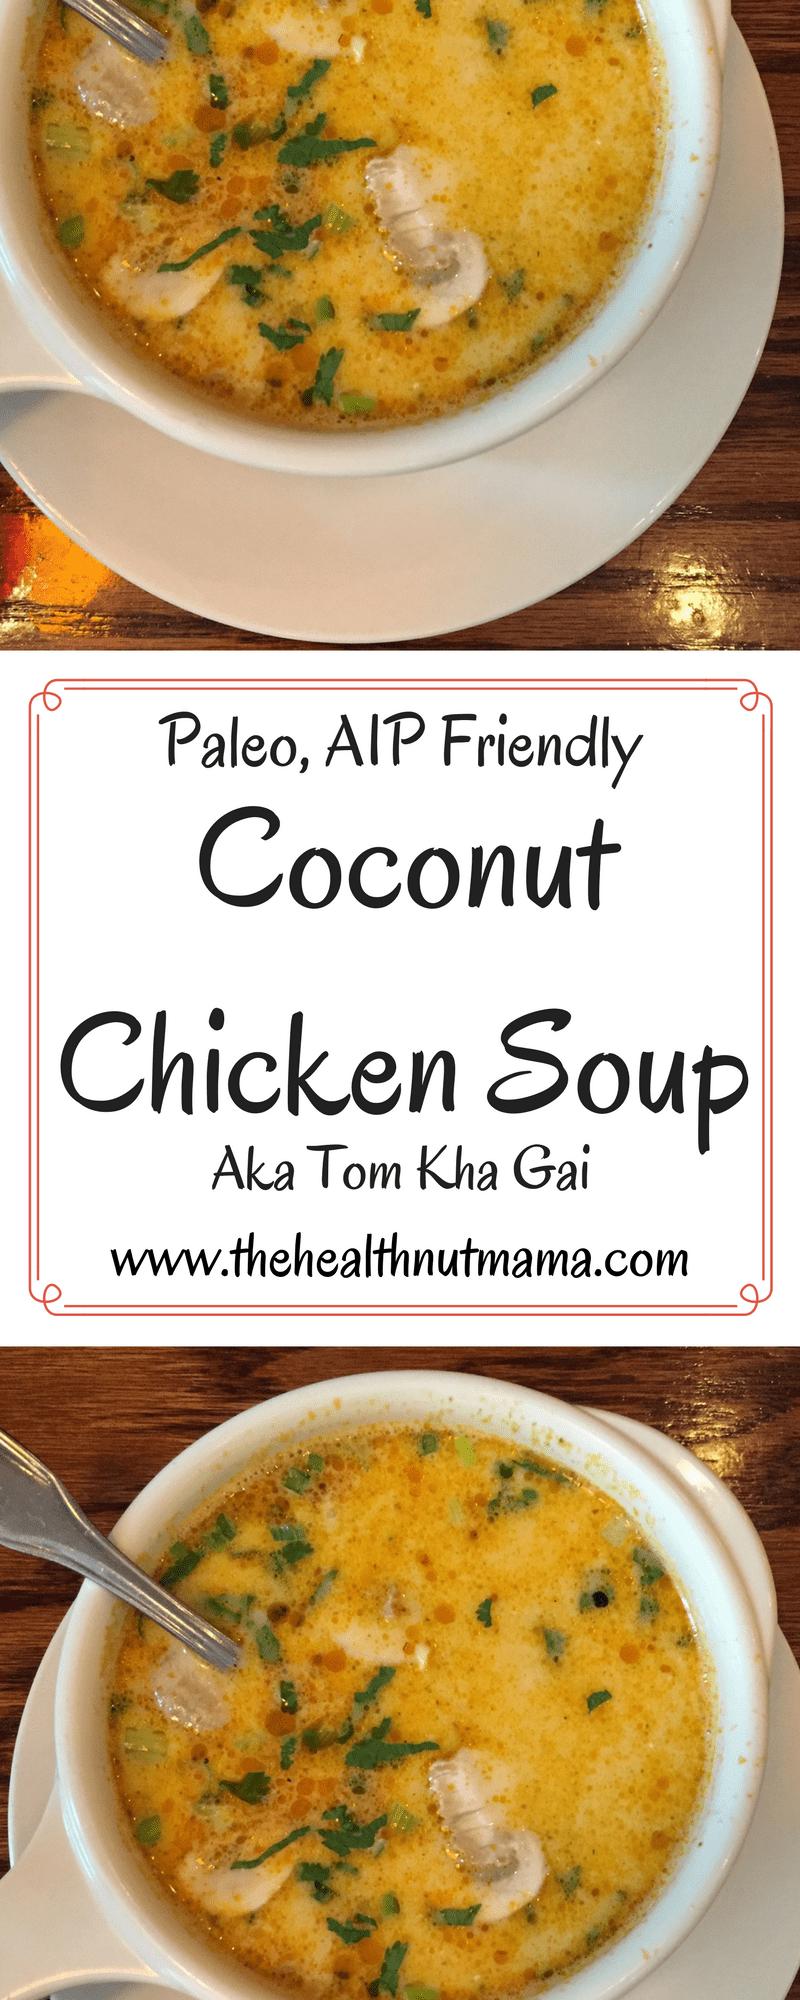 Paleo Tom Kha Gai Coconut Chicken Soup. www.thehealthnutmama.com